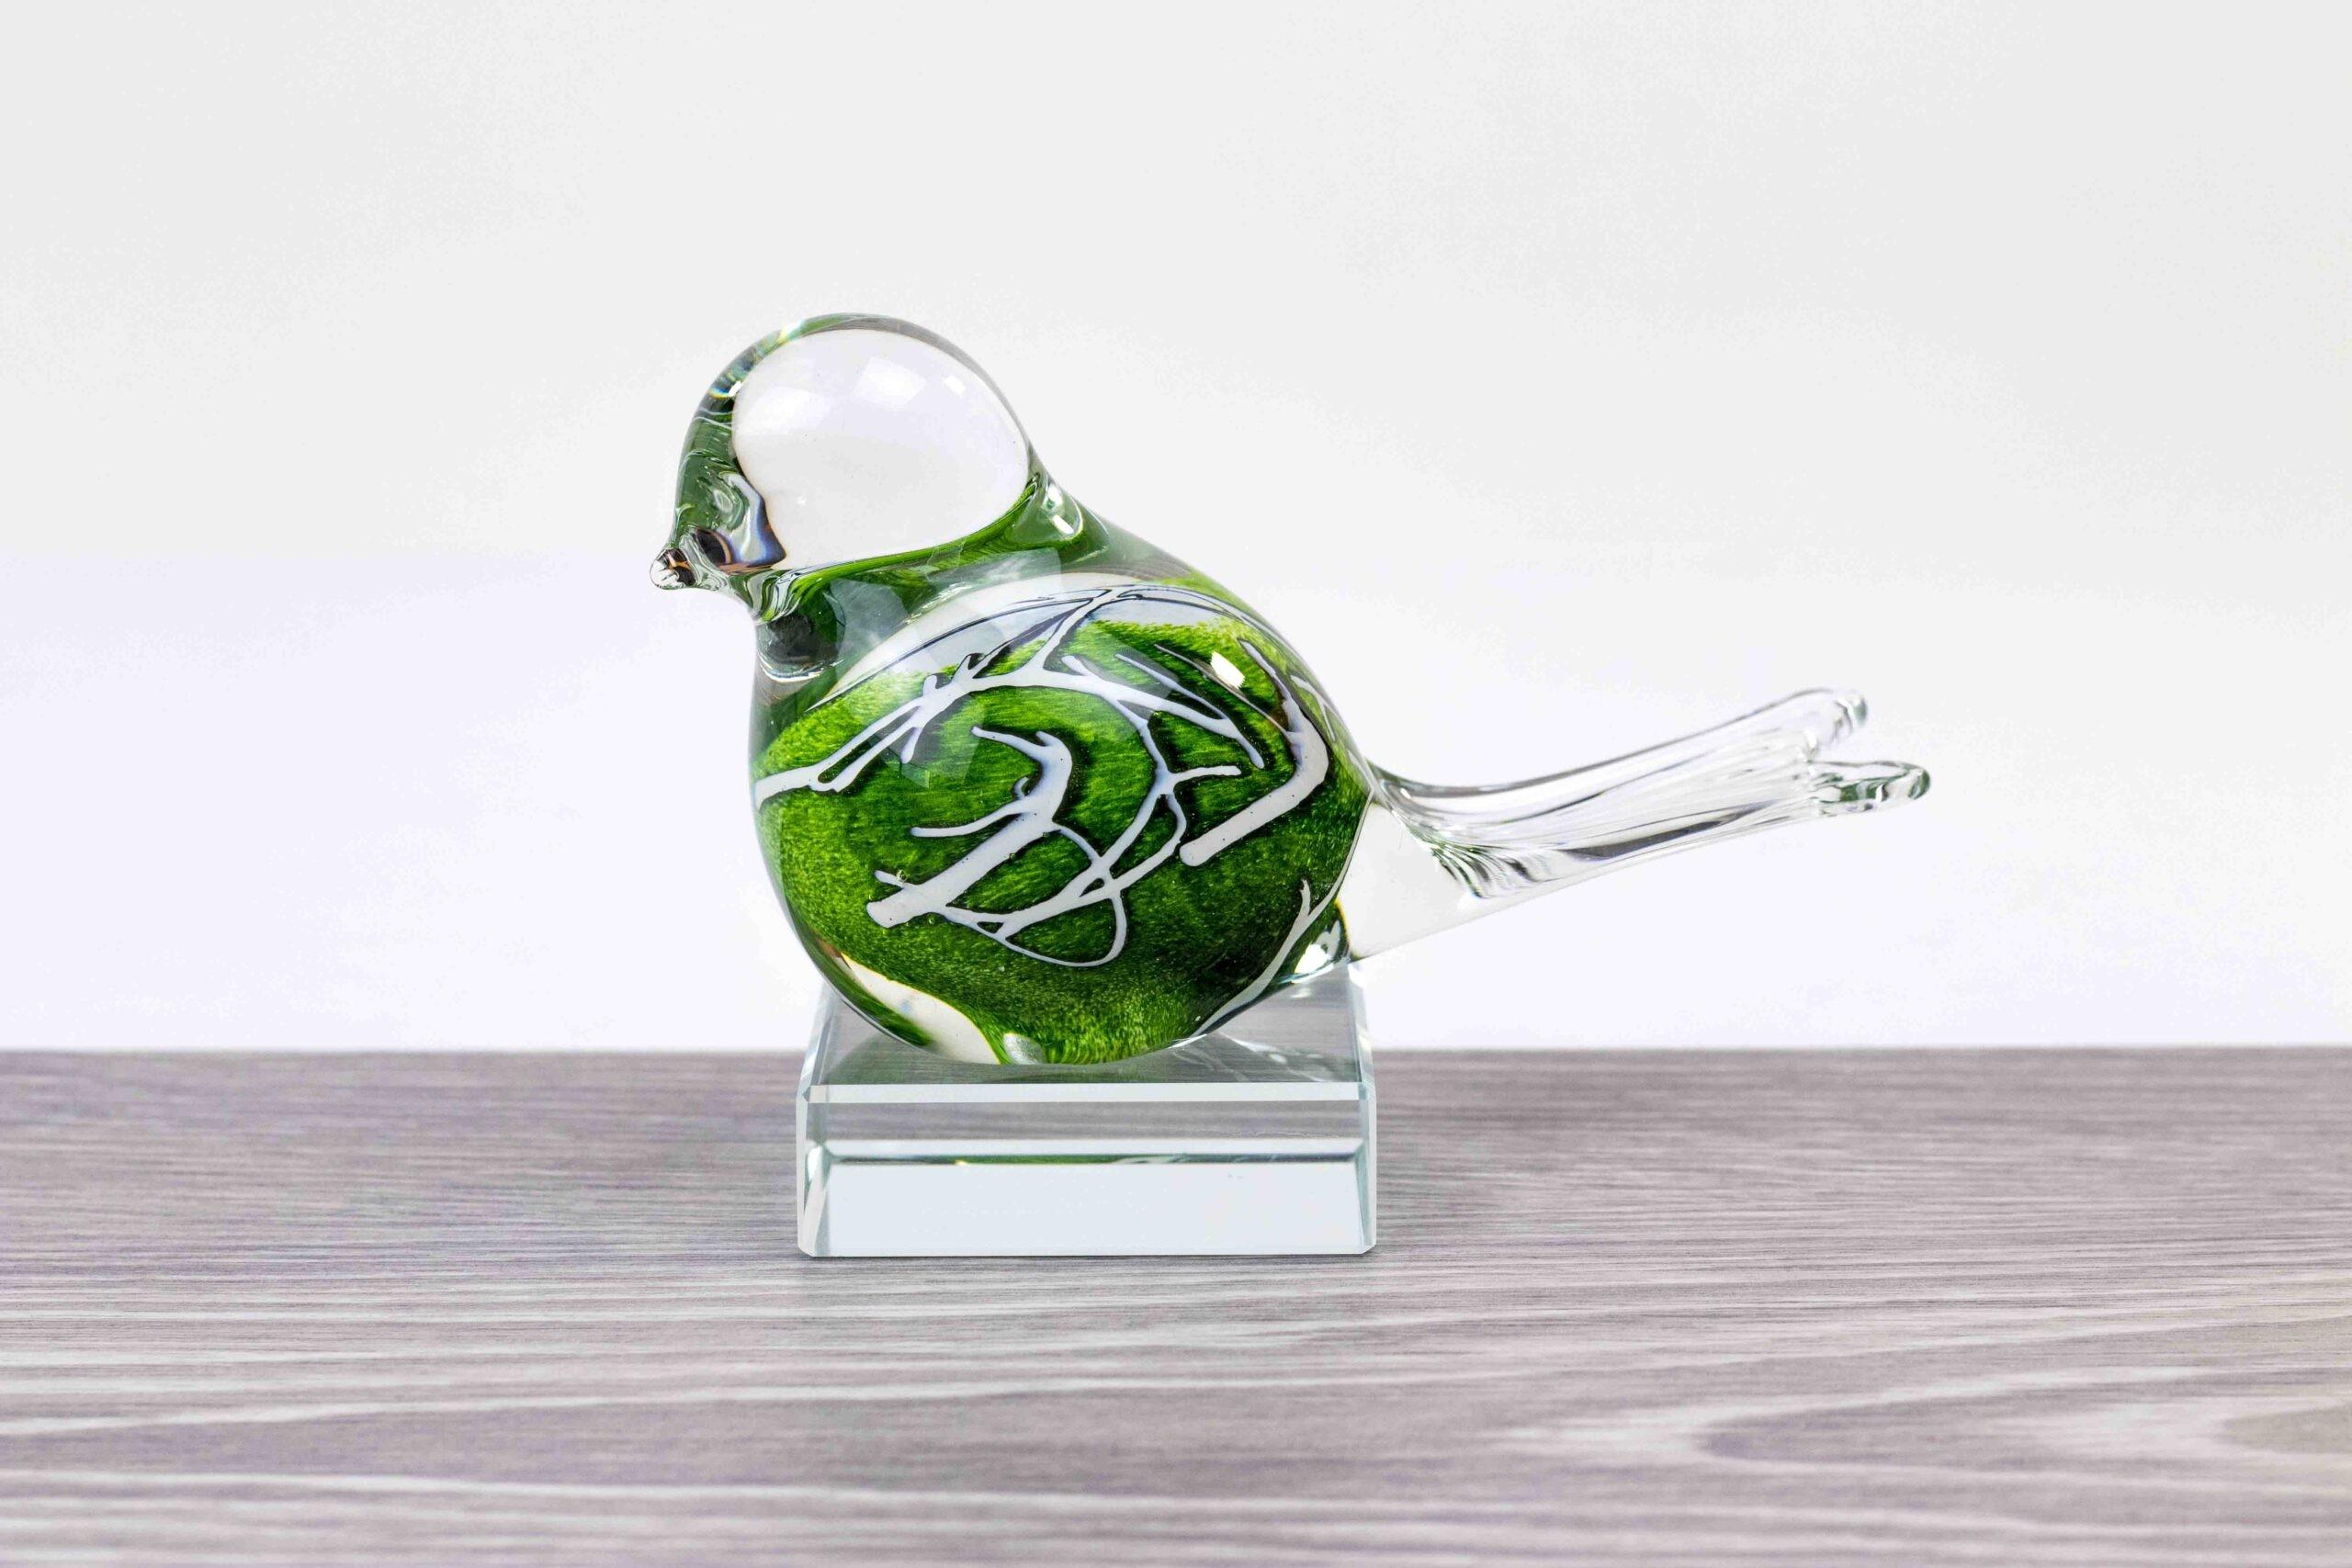 Mini Urn Vogel Groen op kristallen sokkel, Dieren Urn